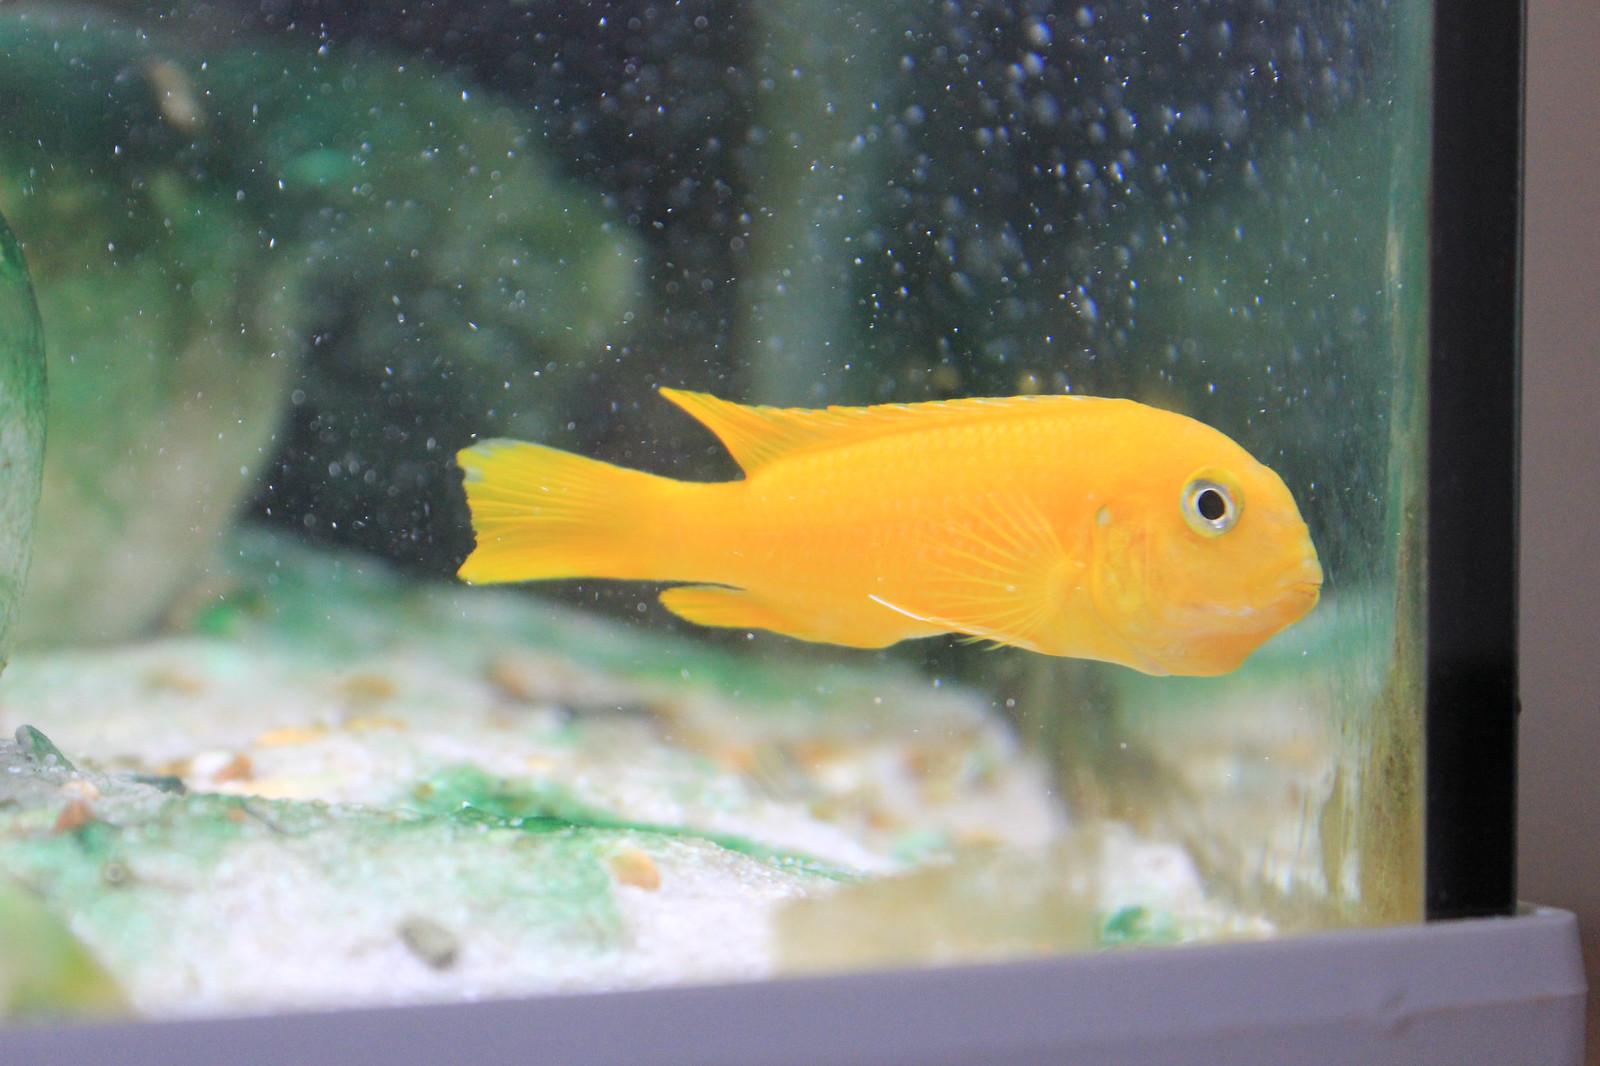 Freshwater aquarium fish not eating - Saulosi Spat Her Fry But Still Not Eating